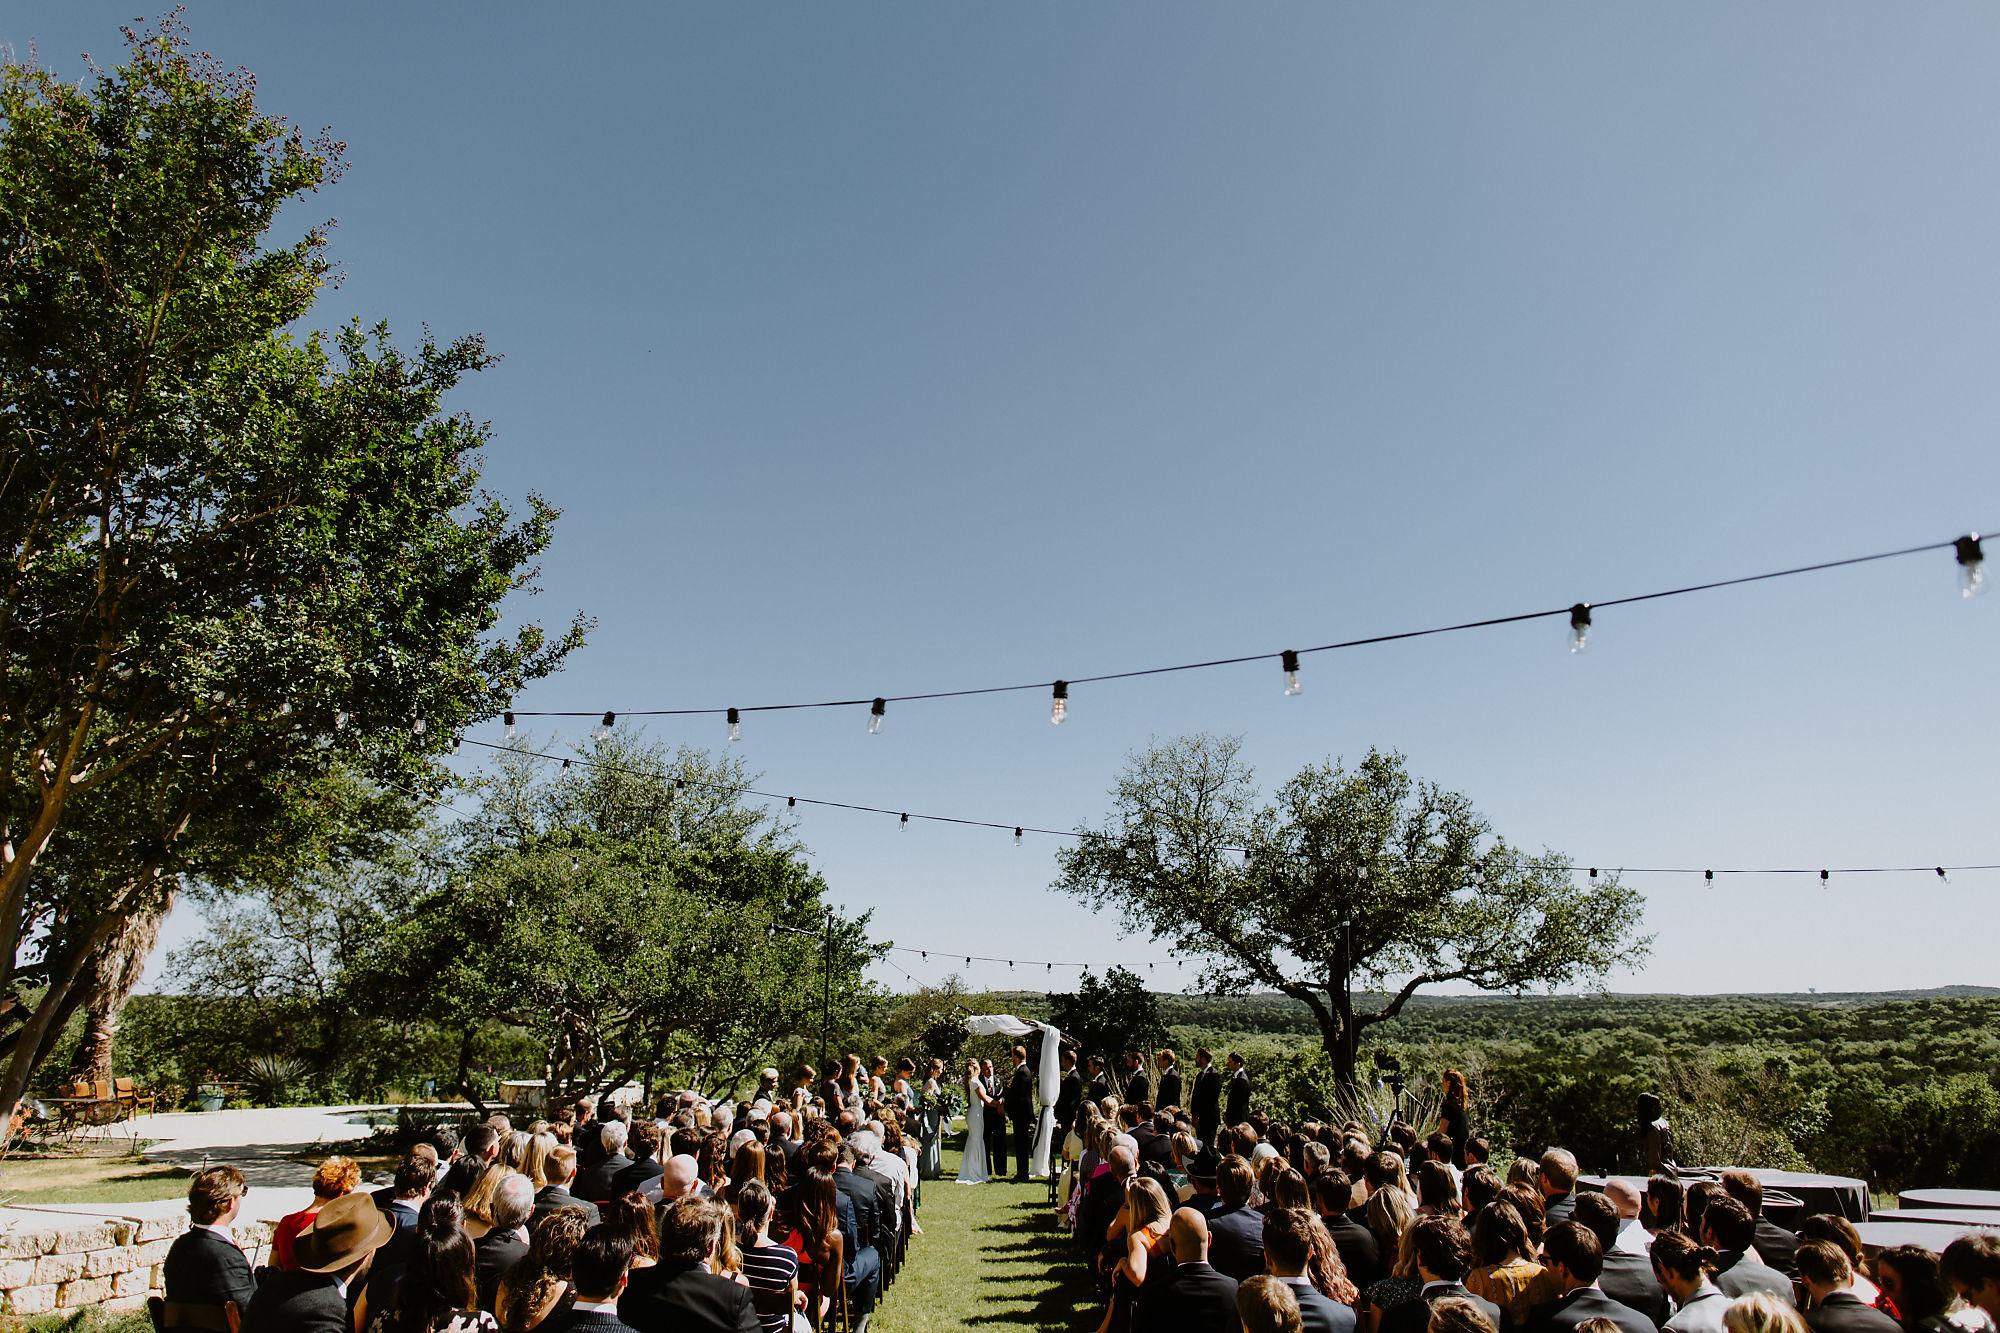 molly_jac_austin_wedding_photos151737.jpg